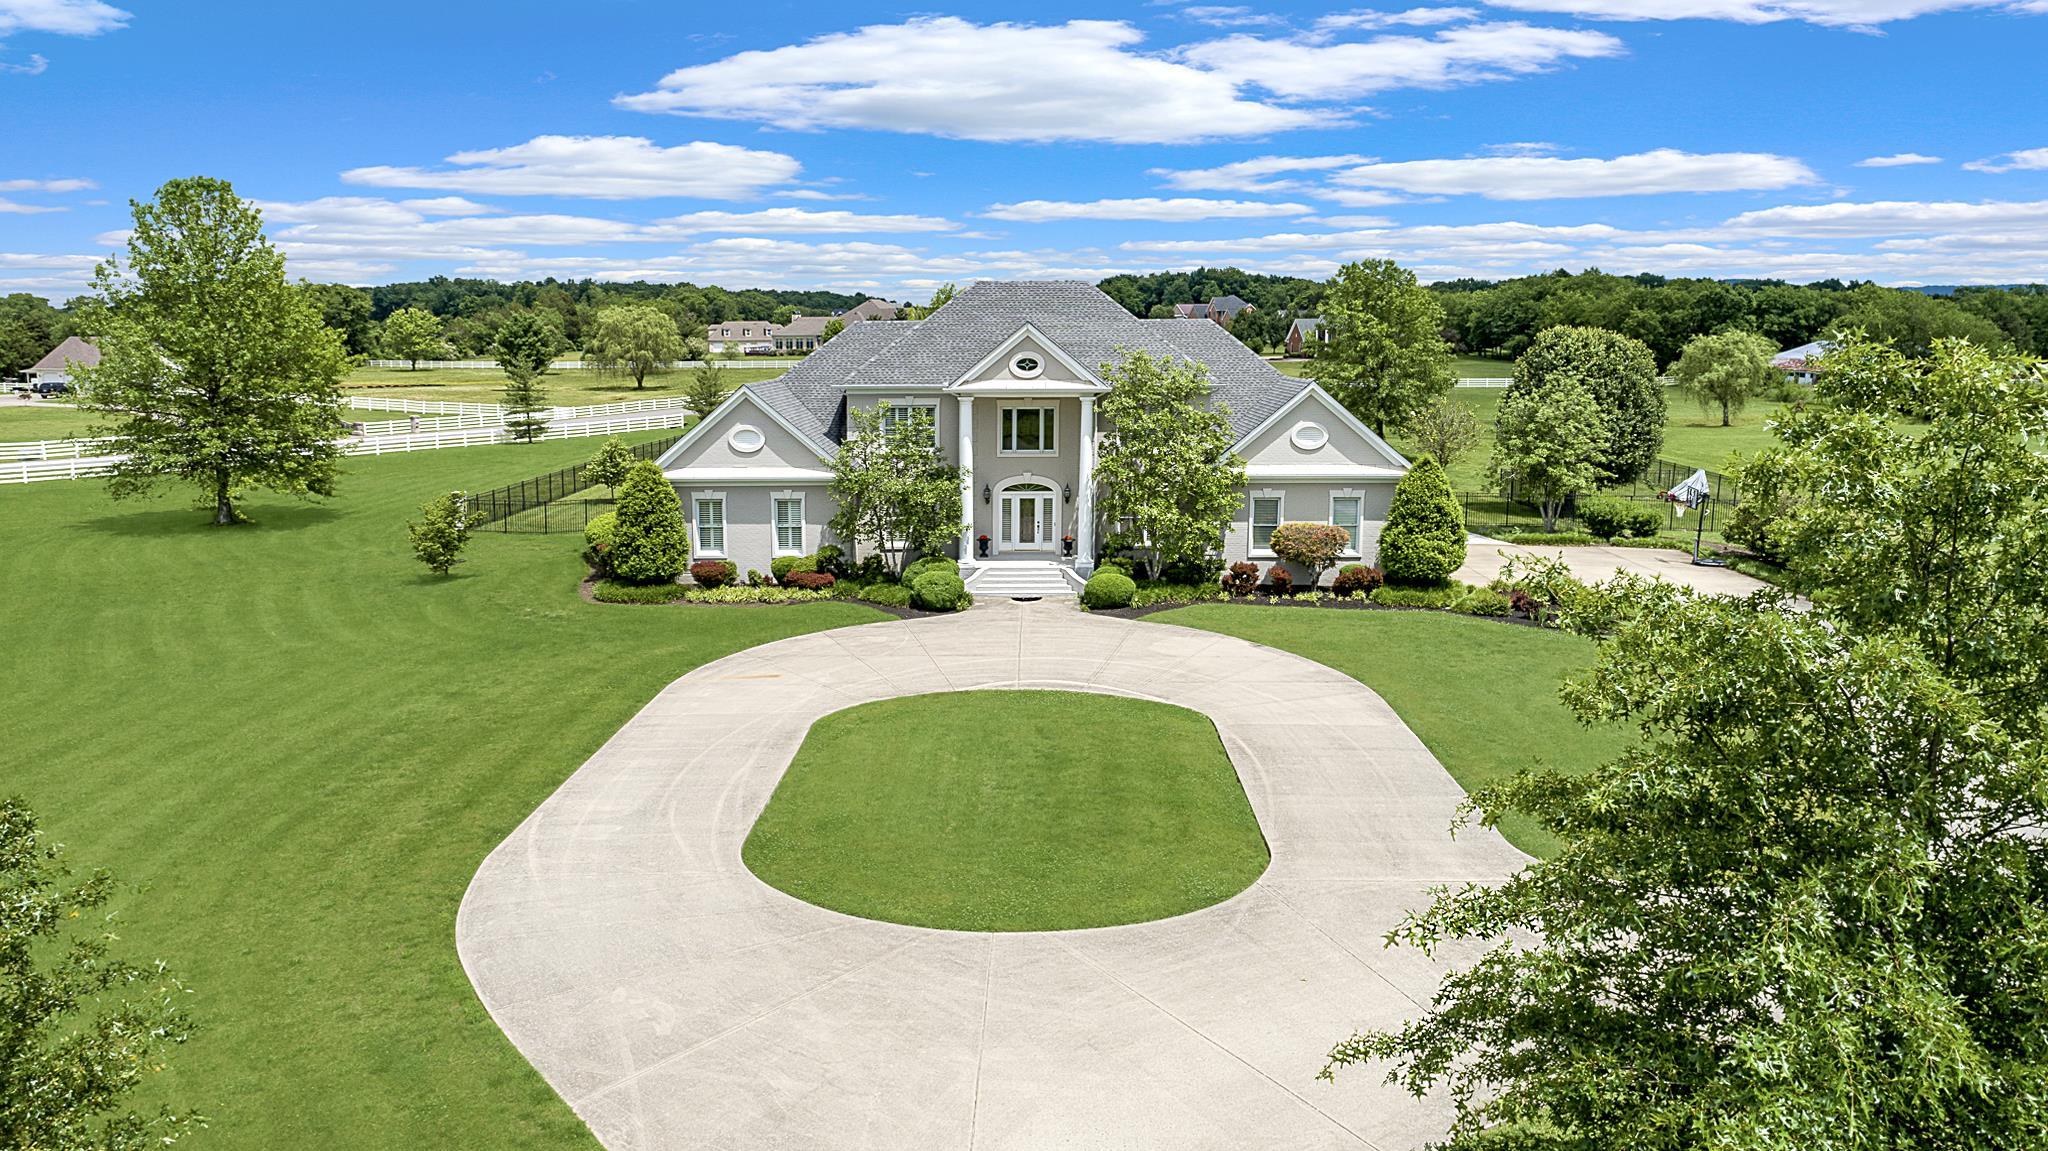 6451 Manchester Pike, Murfreesboro, TN 37127 - Murfreesboro, TN real estate listing